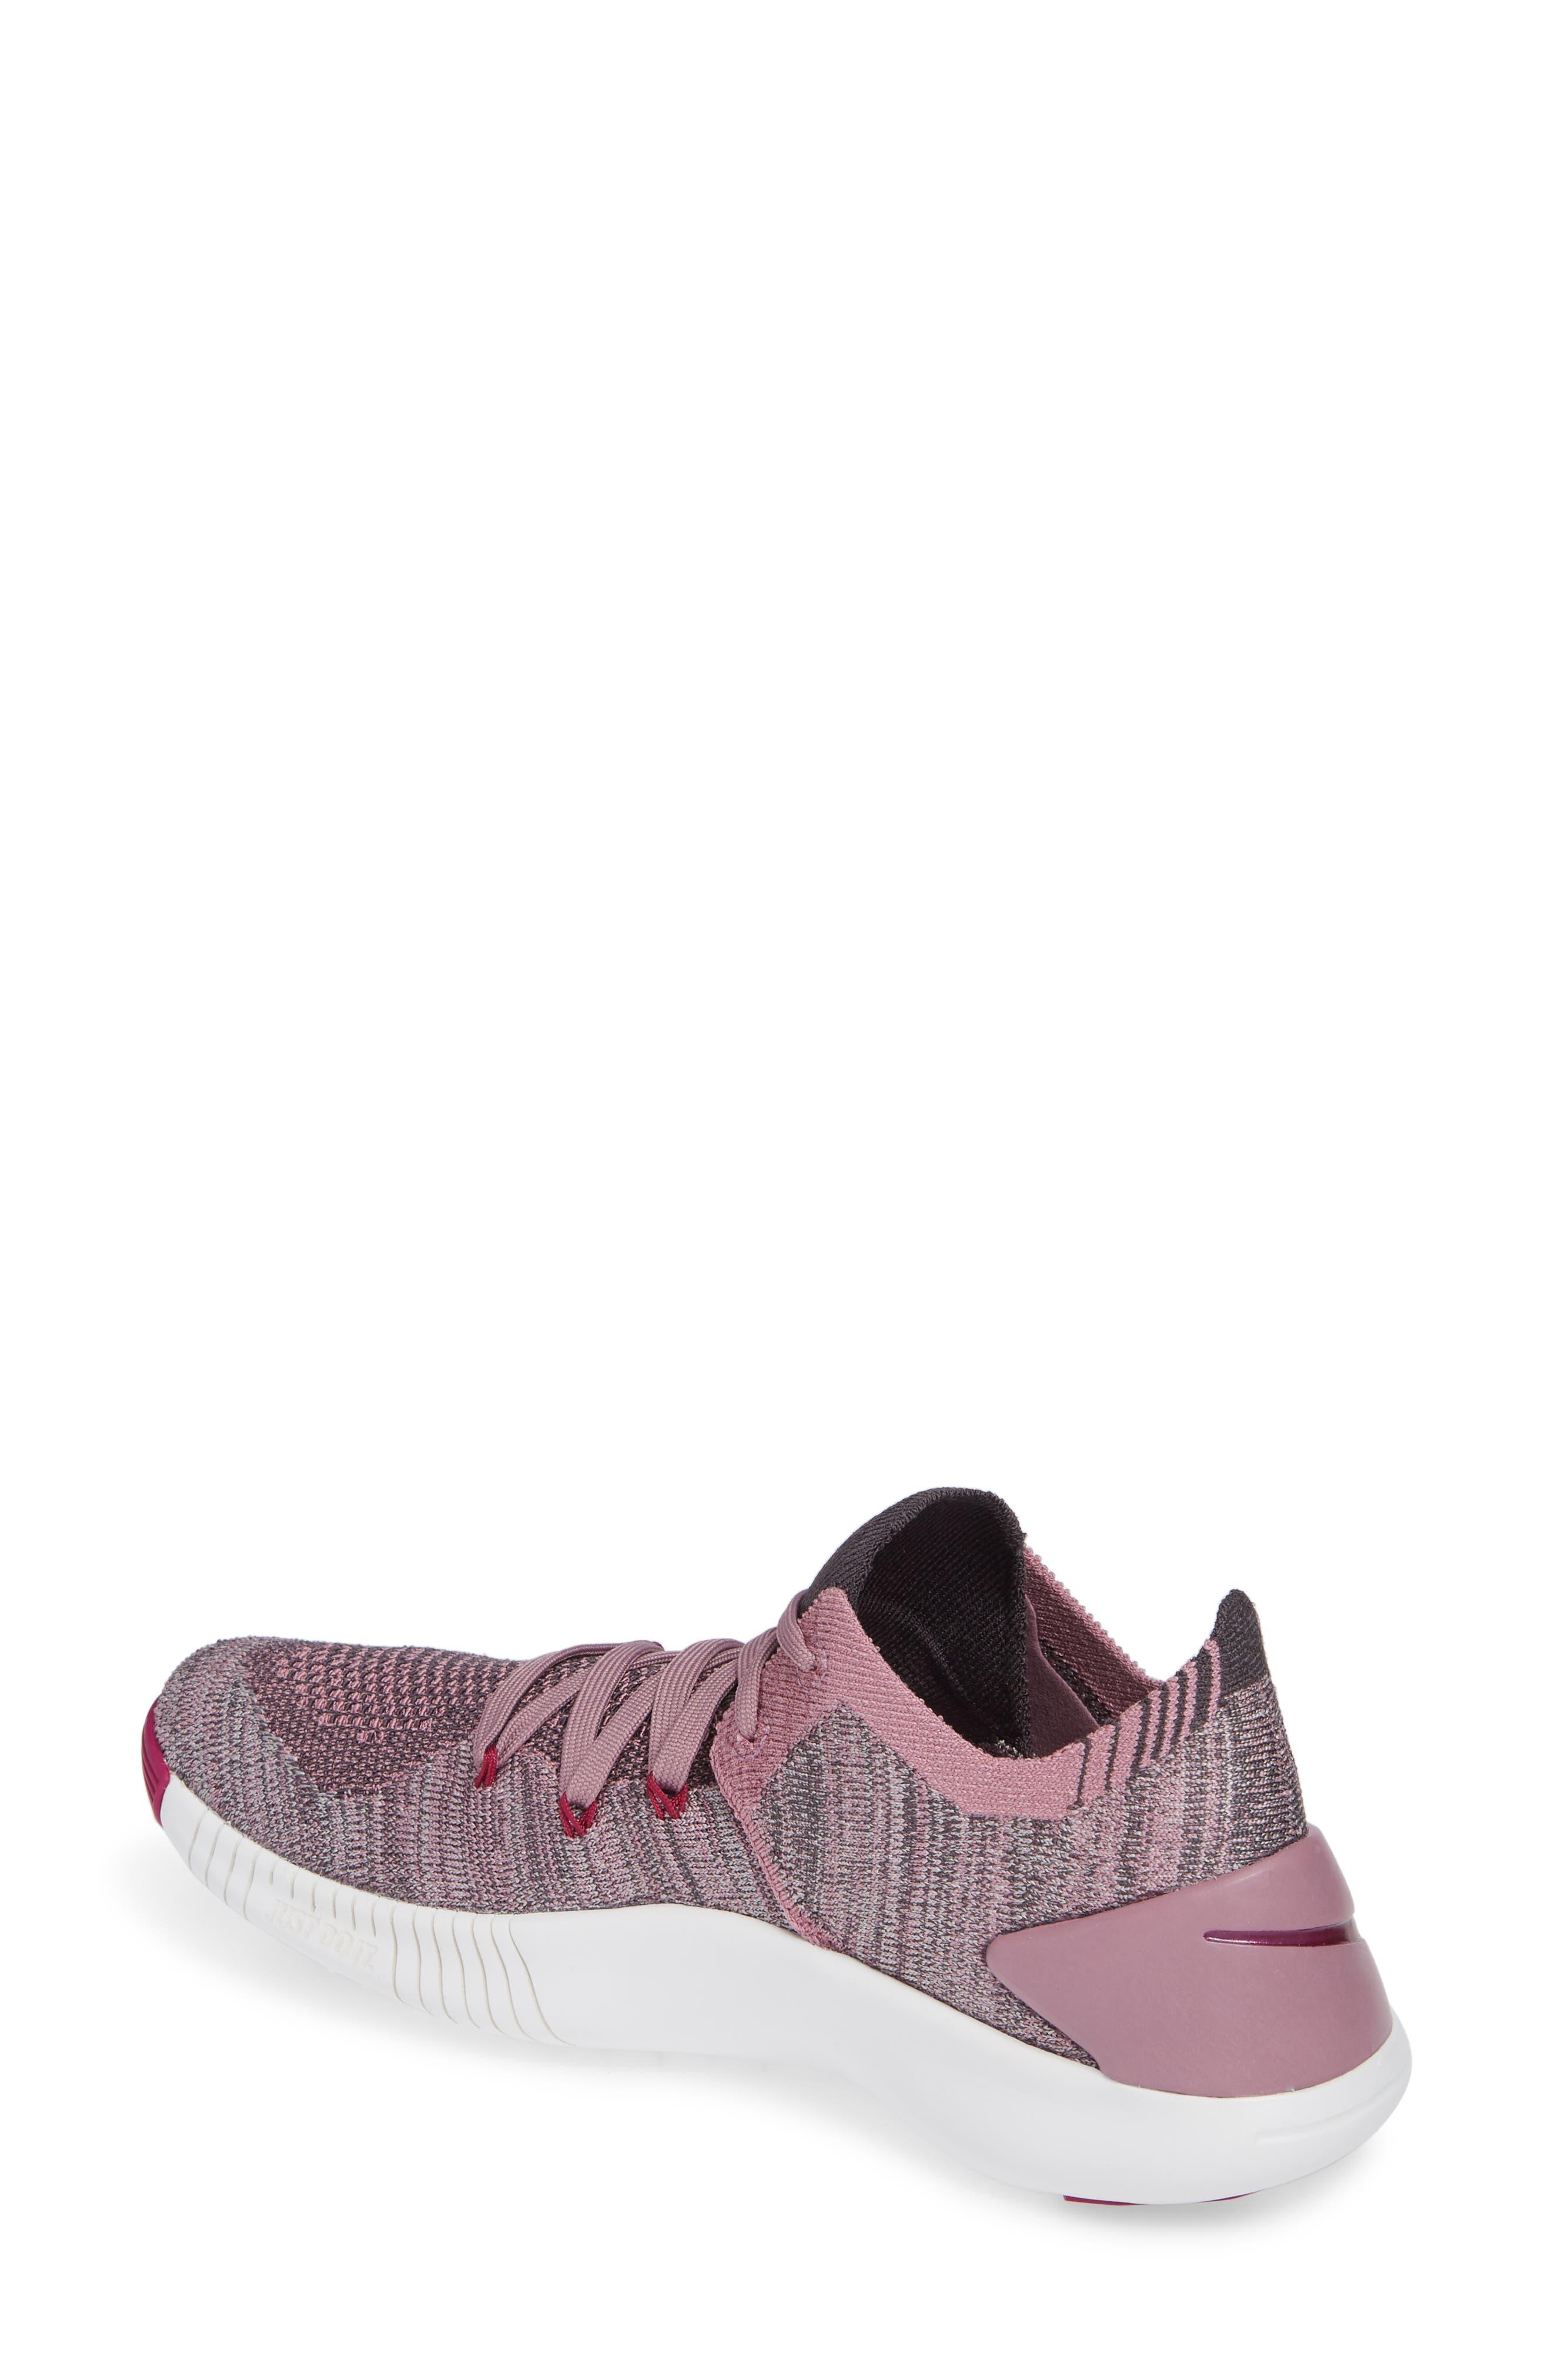 5fcf0c452f27 Nike Free Run